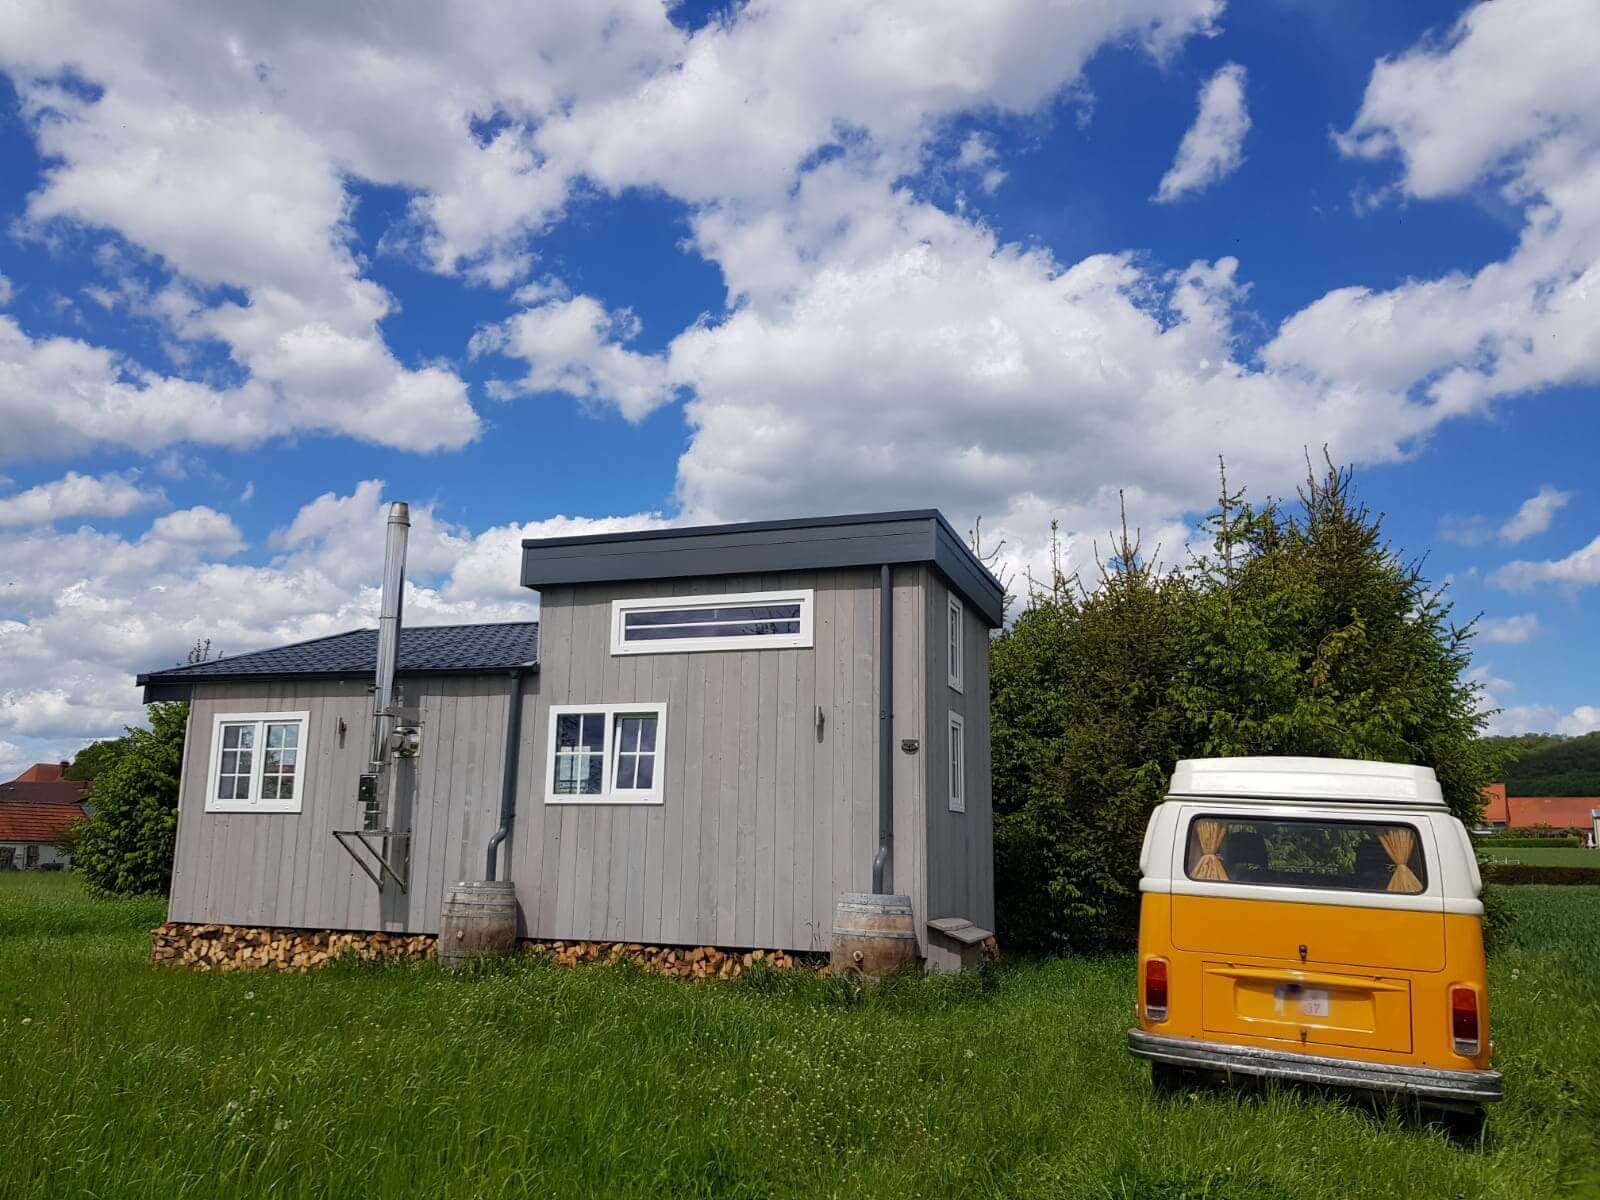 mobiles-tiny-house-lappland-vital-camp-gmbh-02